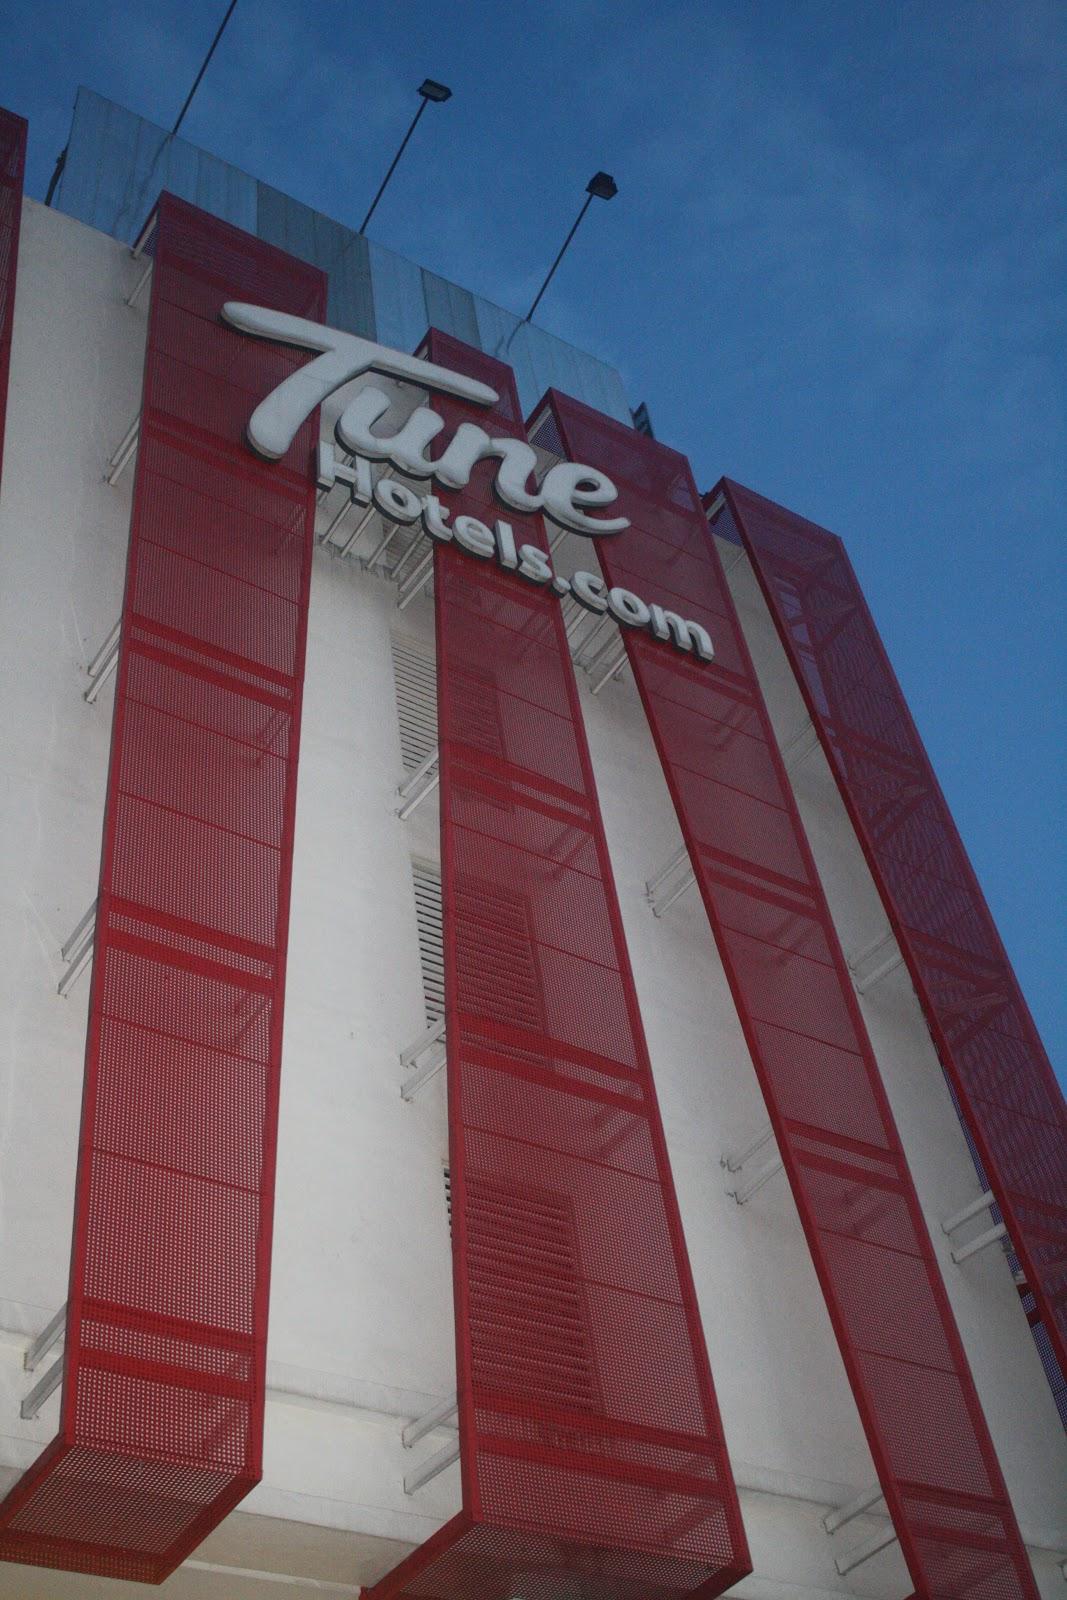 Bas Dari Tune Hotel Jb Ke Uss [Siaya County]